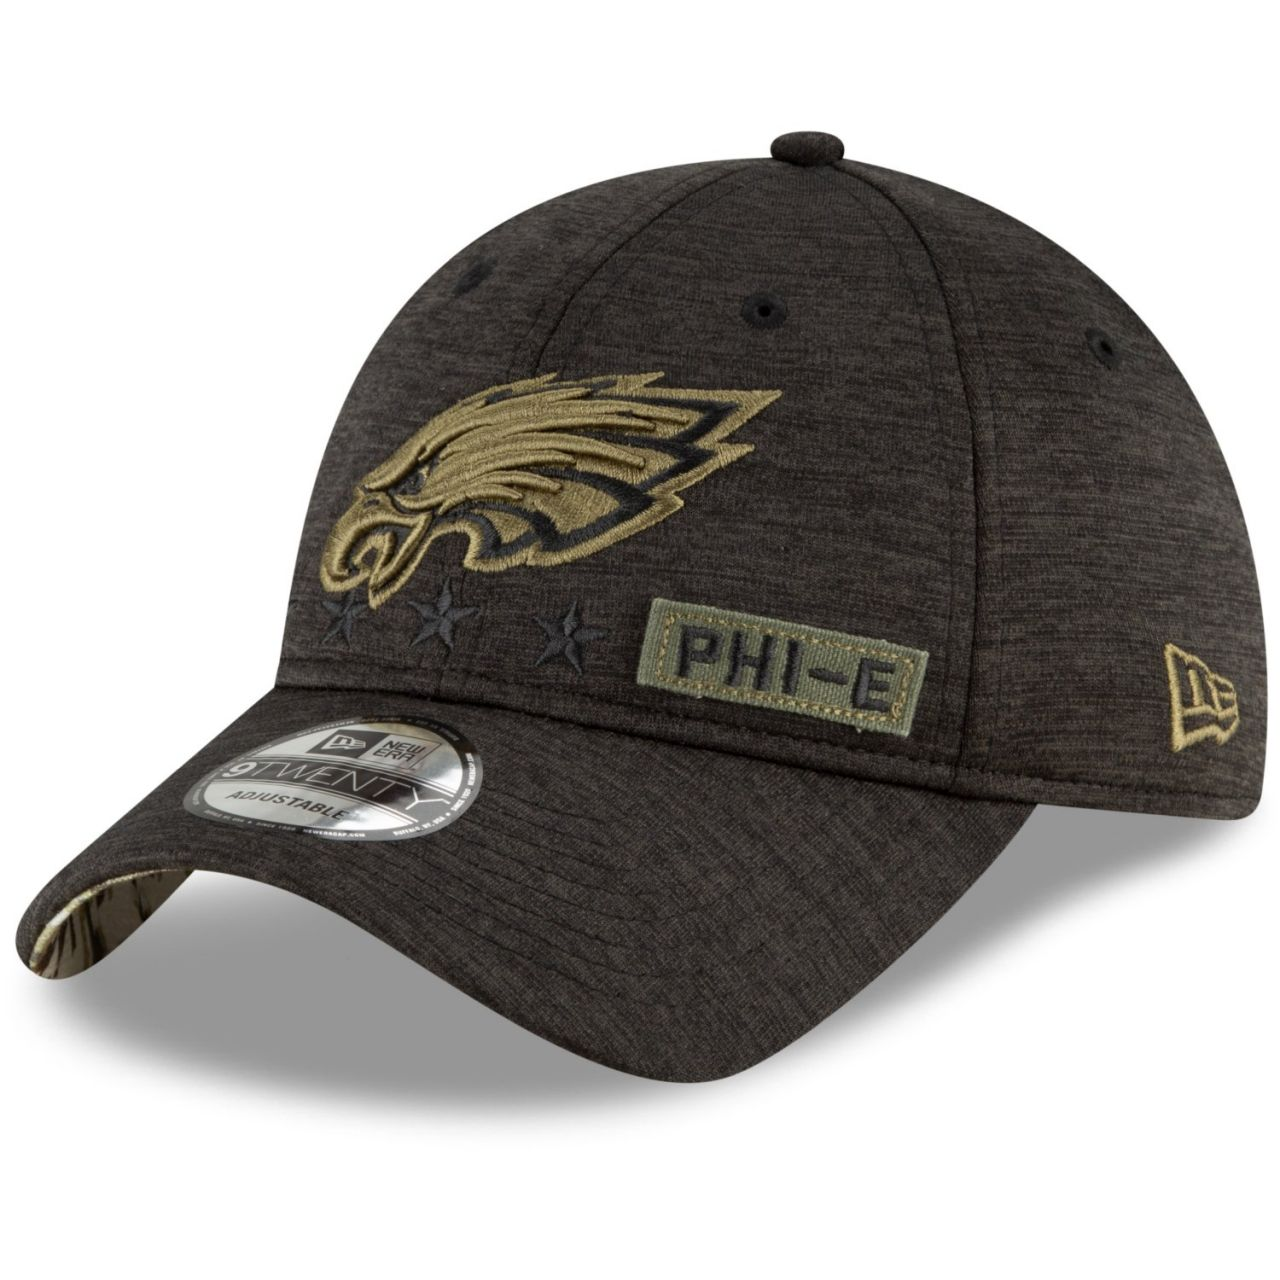 amfoo - New Era 9TWENTY Cap Salute to Service Philadelphia Eagles